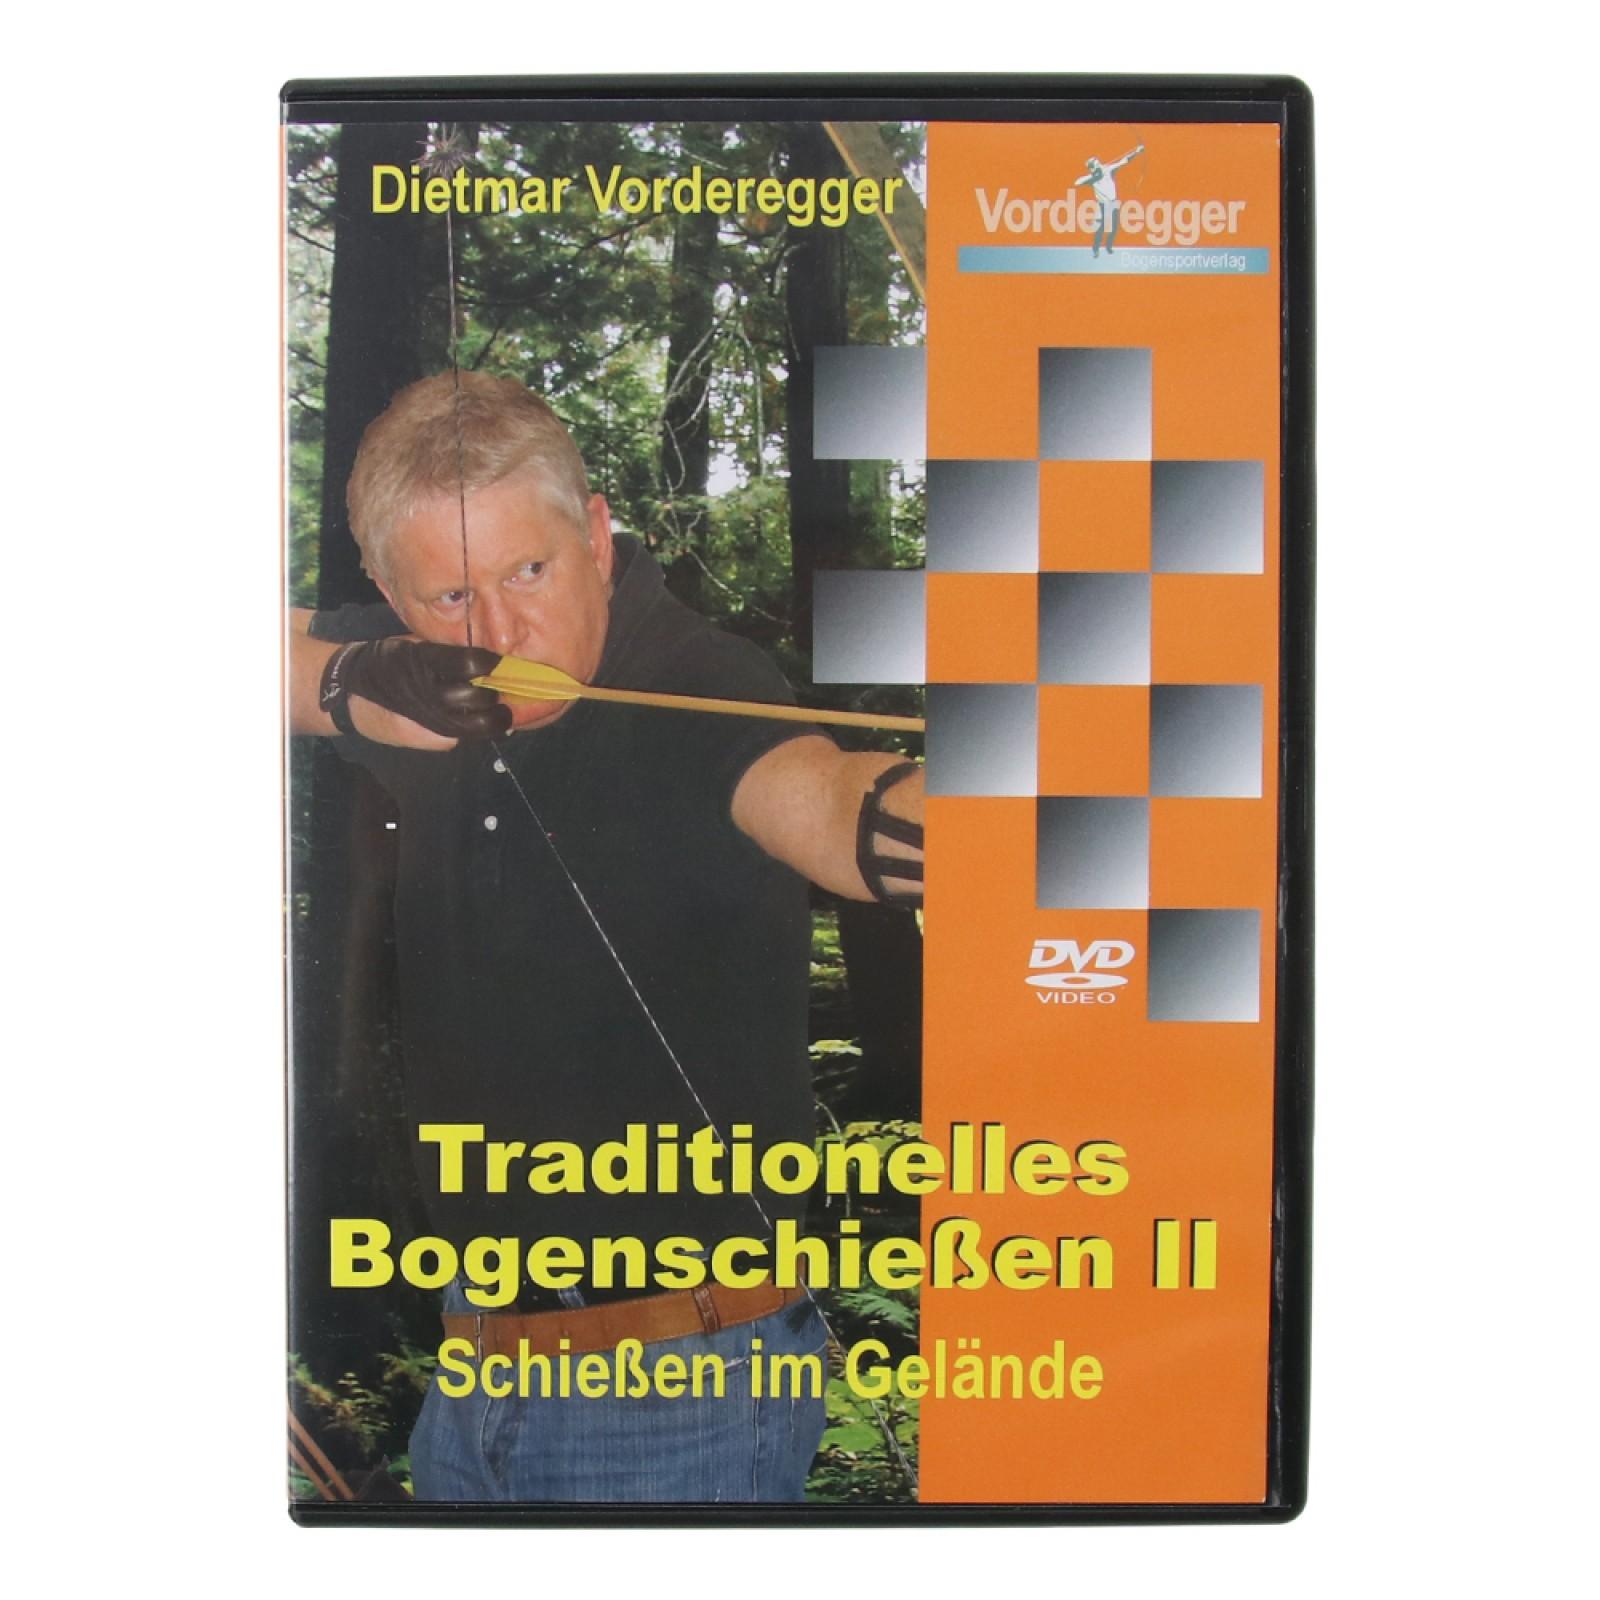 DVD - Tradiční lukostřelba II Traditionelles Bogenschießen II -